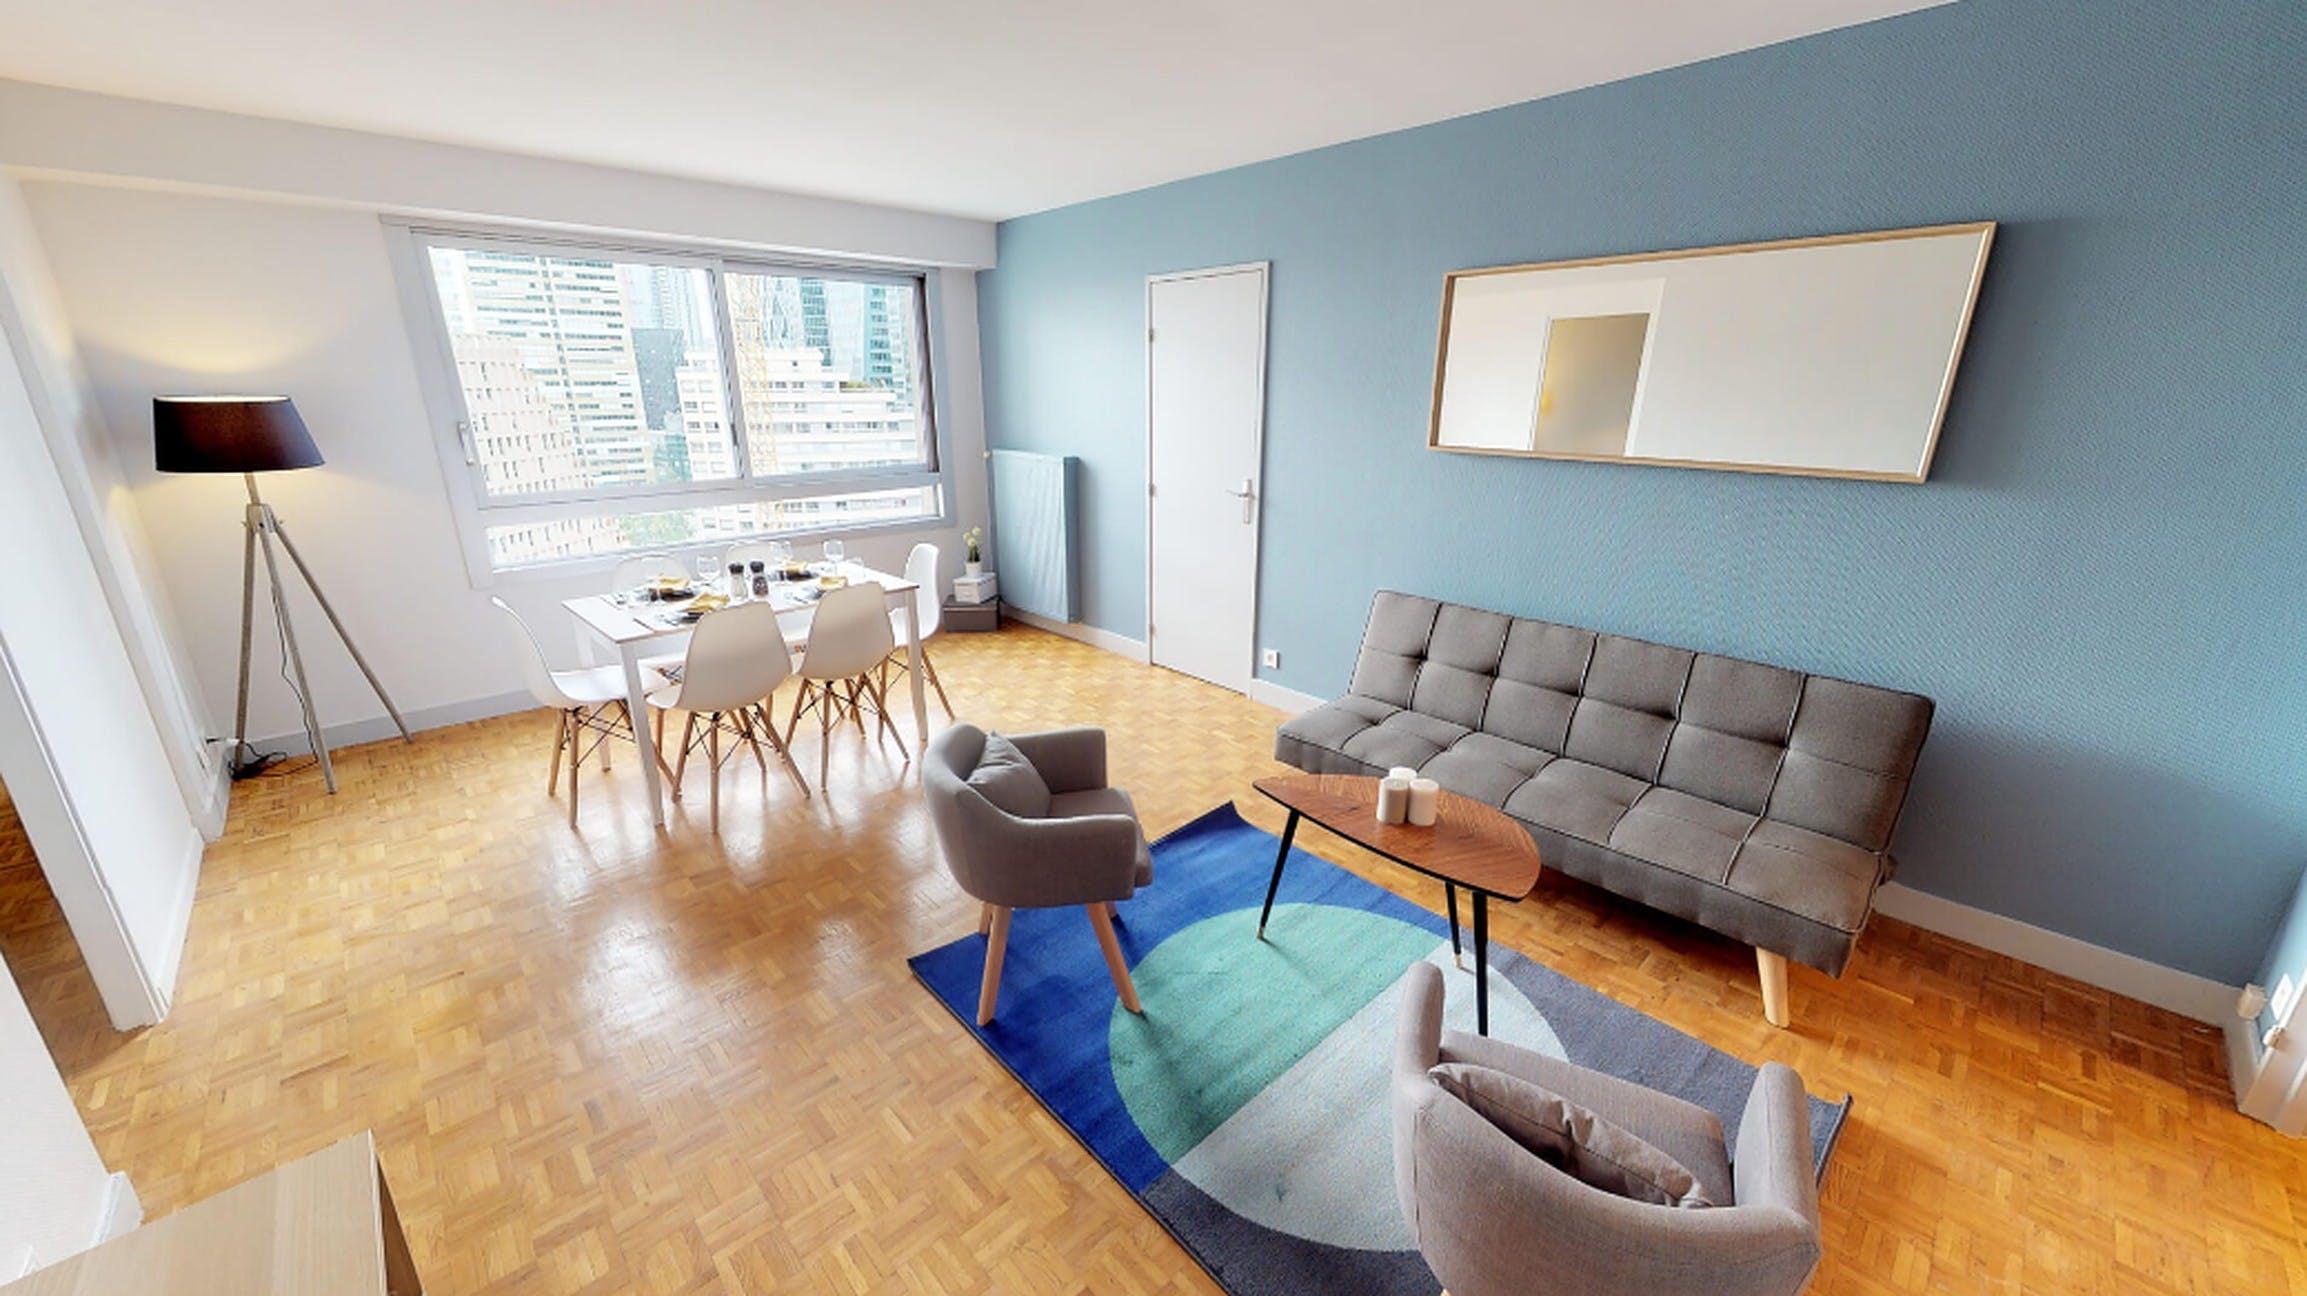 4 Residents | Courbevoie | Stunning Bright Apt.